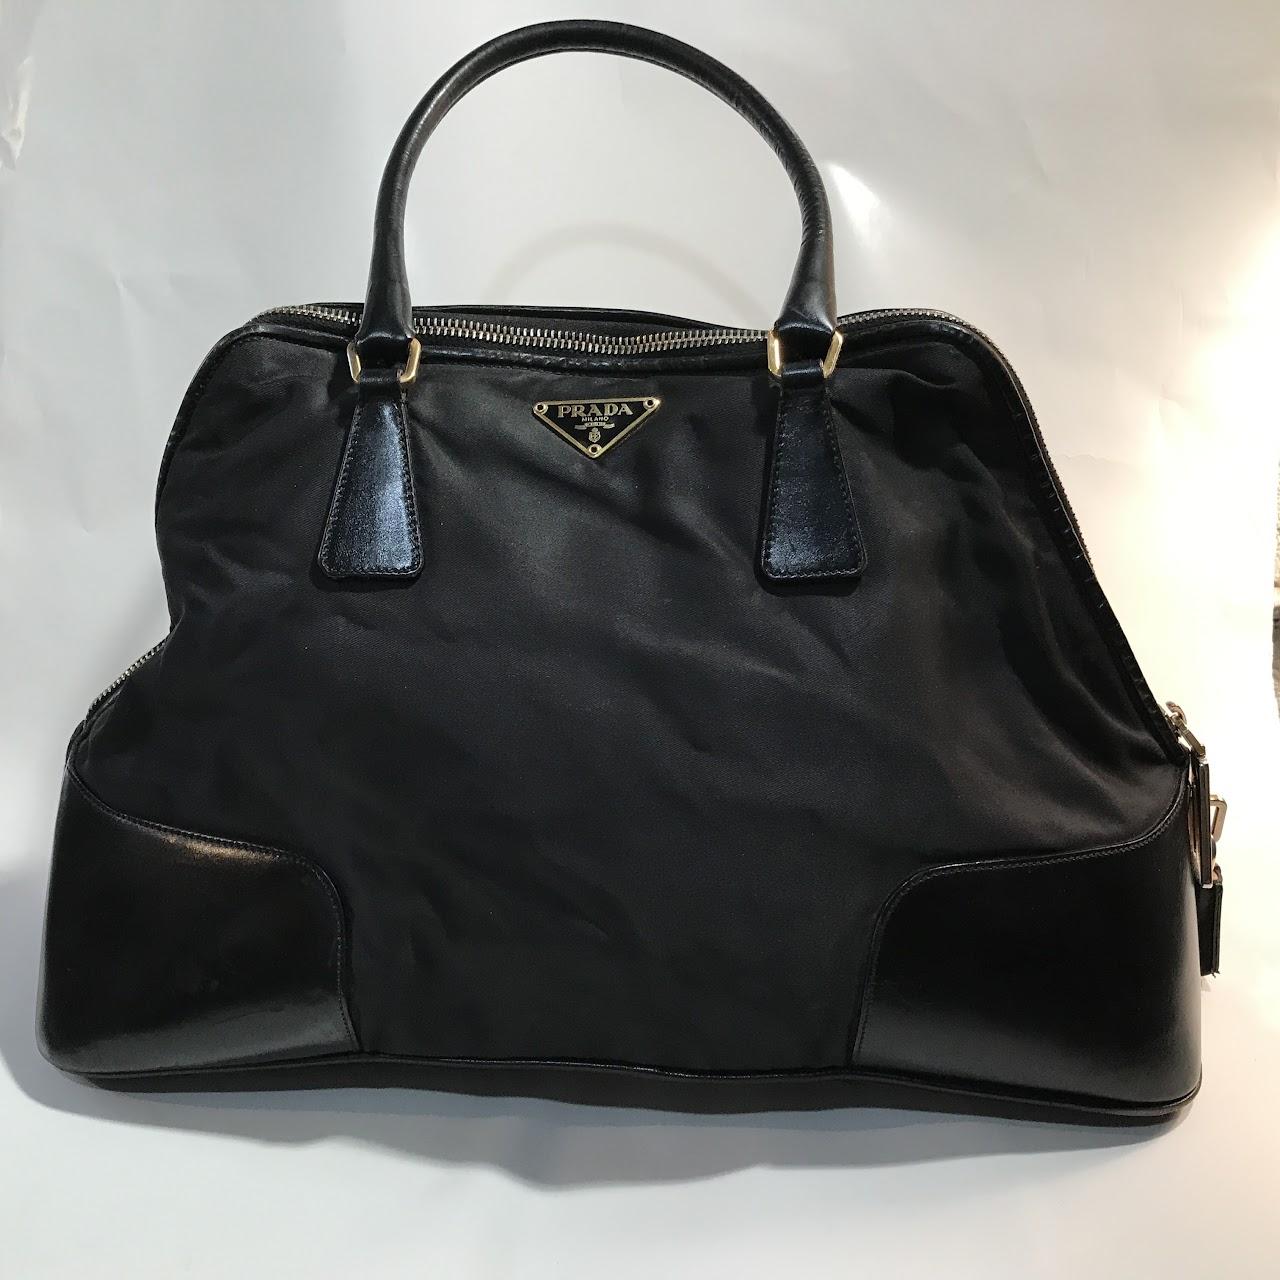 bae0bd55 low price prada classic black handbag d11f5 b000d